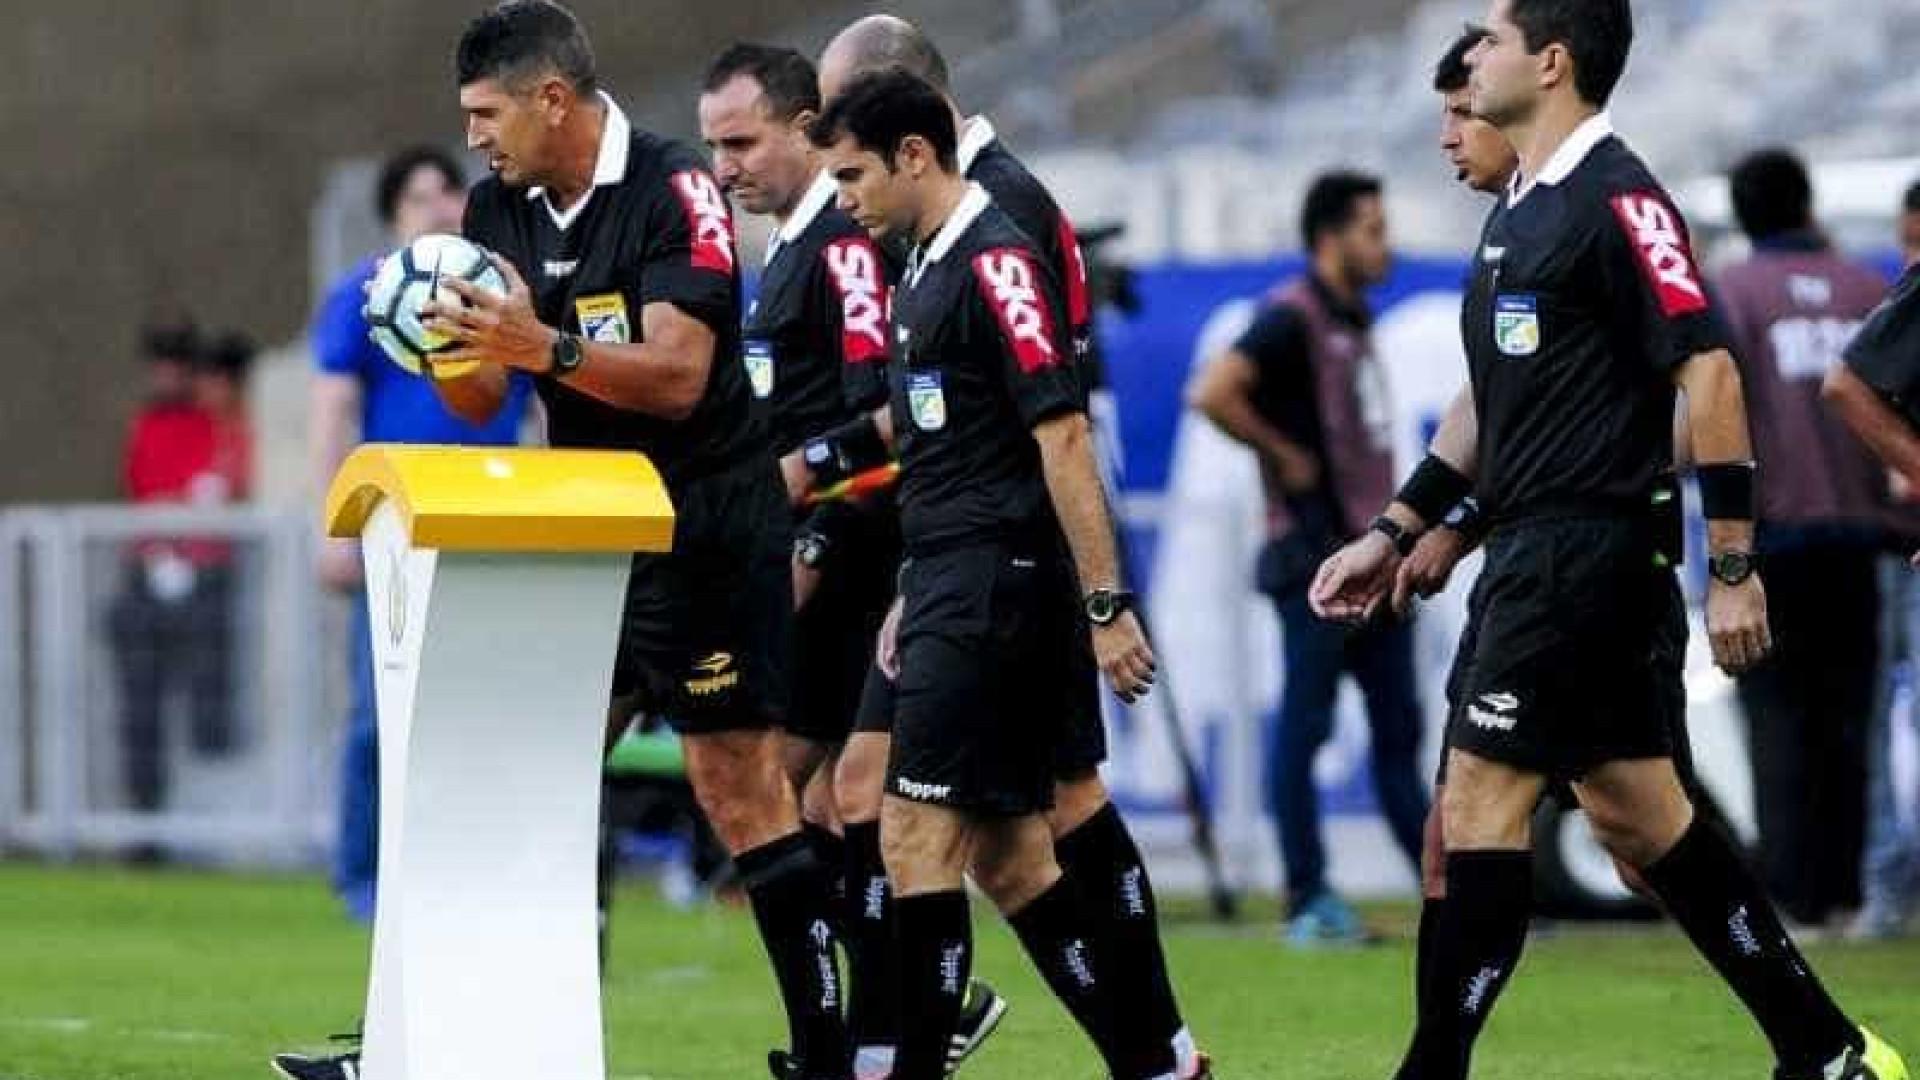 CBF contrata seguro para árbitros de futebol